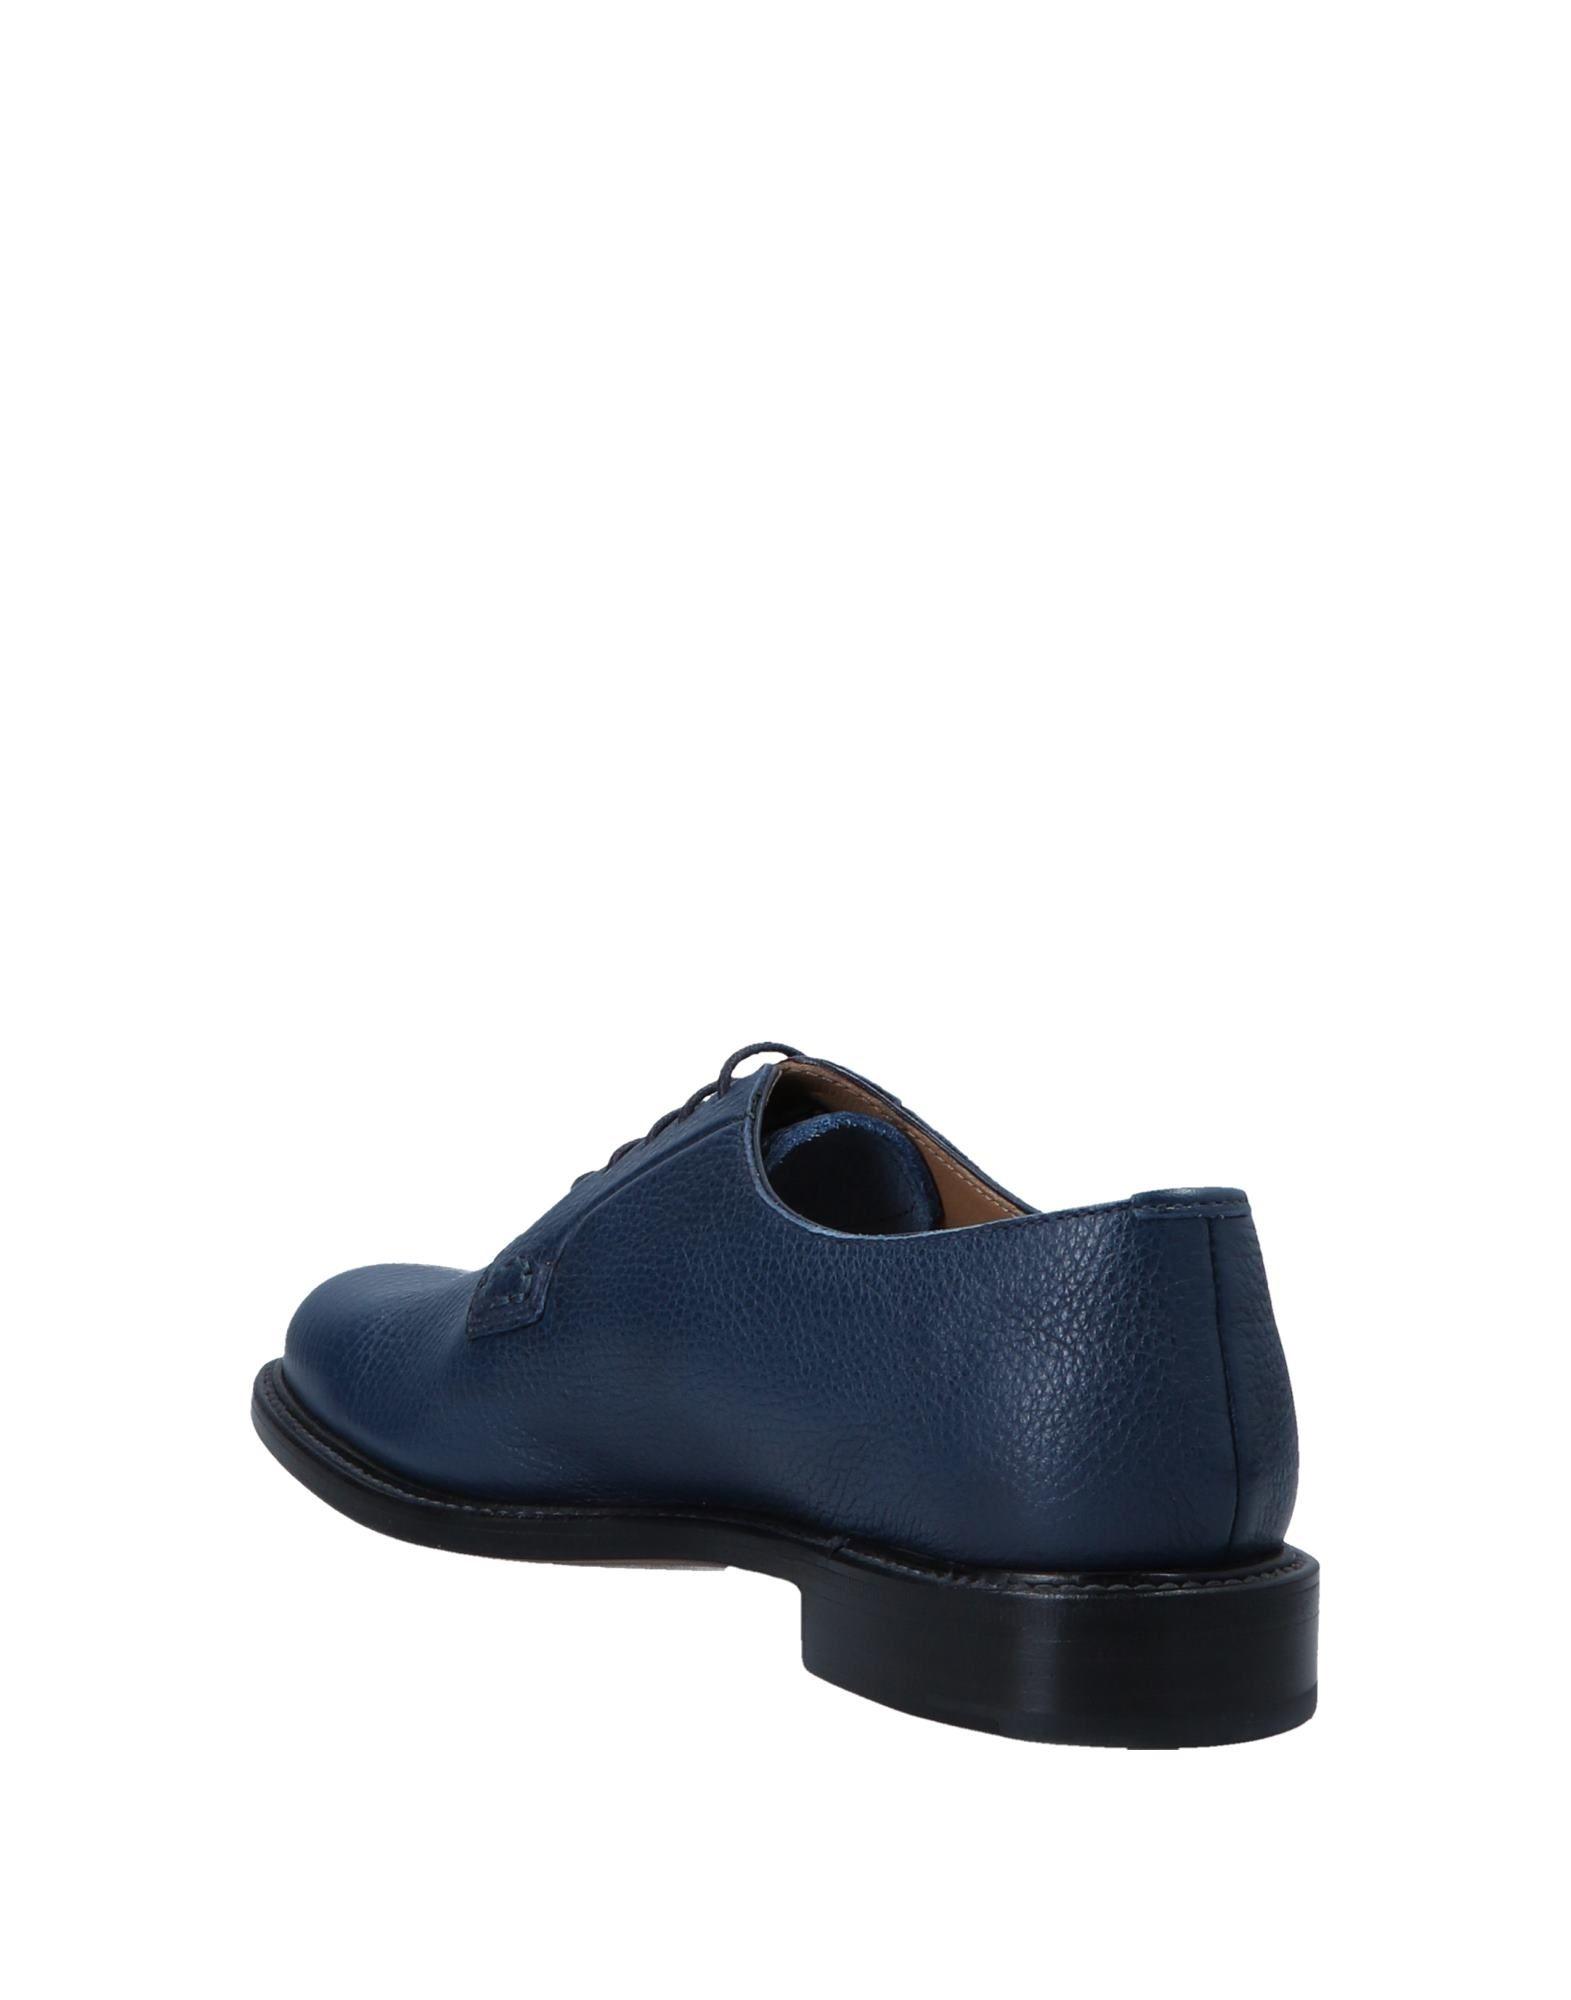 Church's Schnürschuhe Damen  11527860EFGünstige Schuhe gut aussehende Schuhe 11527860EFGünstige 8d9153